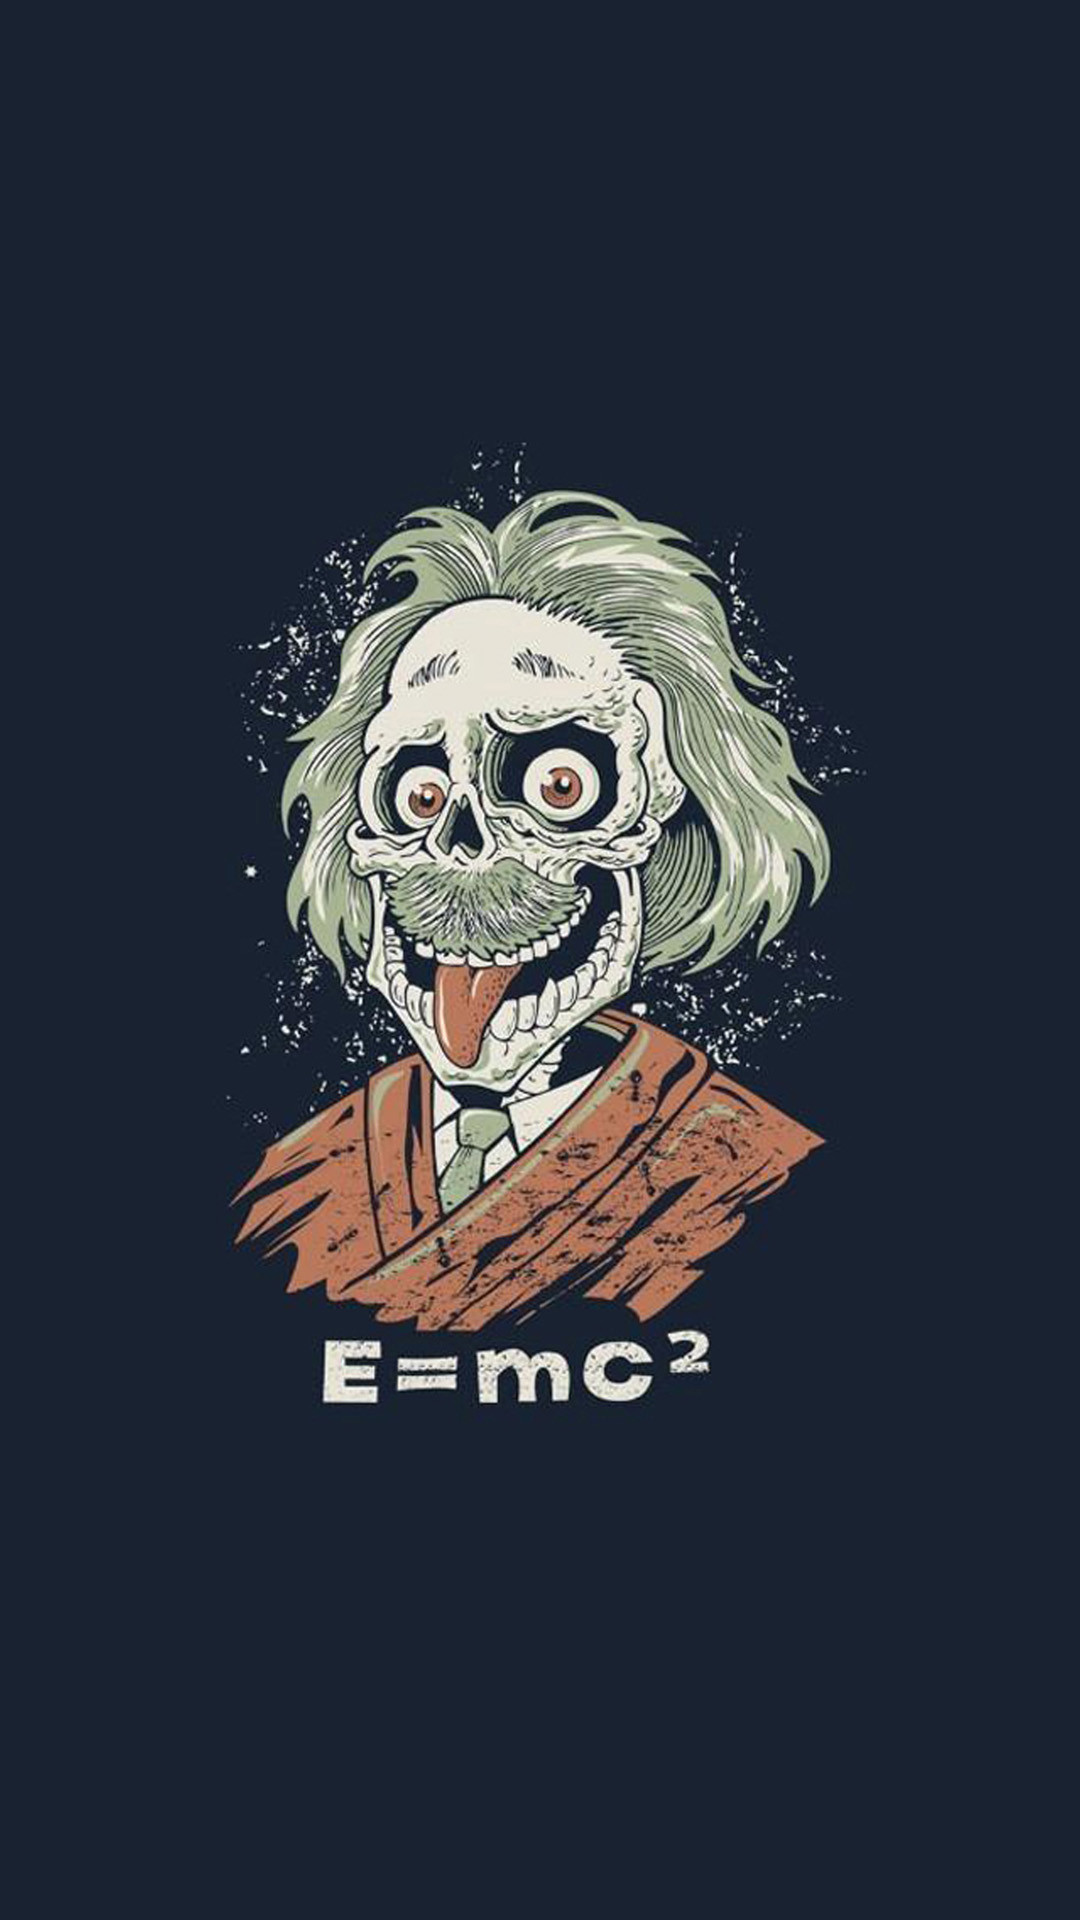 Funny Albert Einstein Caricature HD Wallpaper iPhone 6 plus